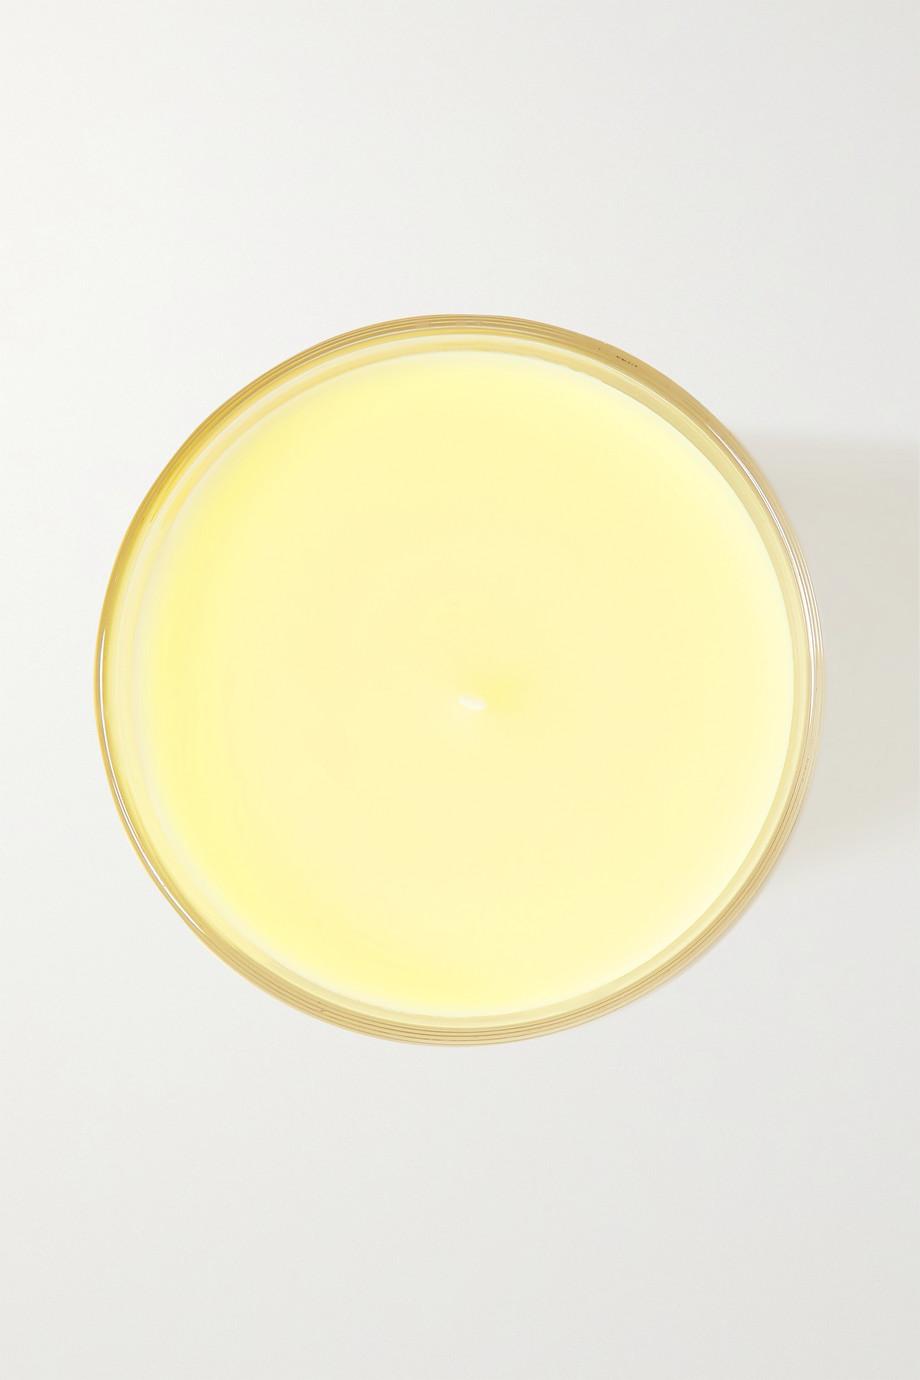 Diptyque Citronelle Duftkerze, 190 g